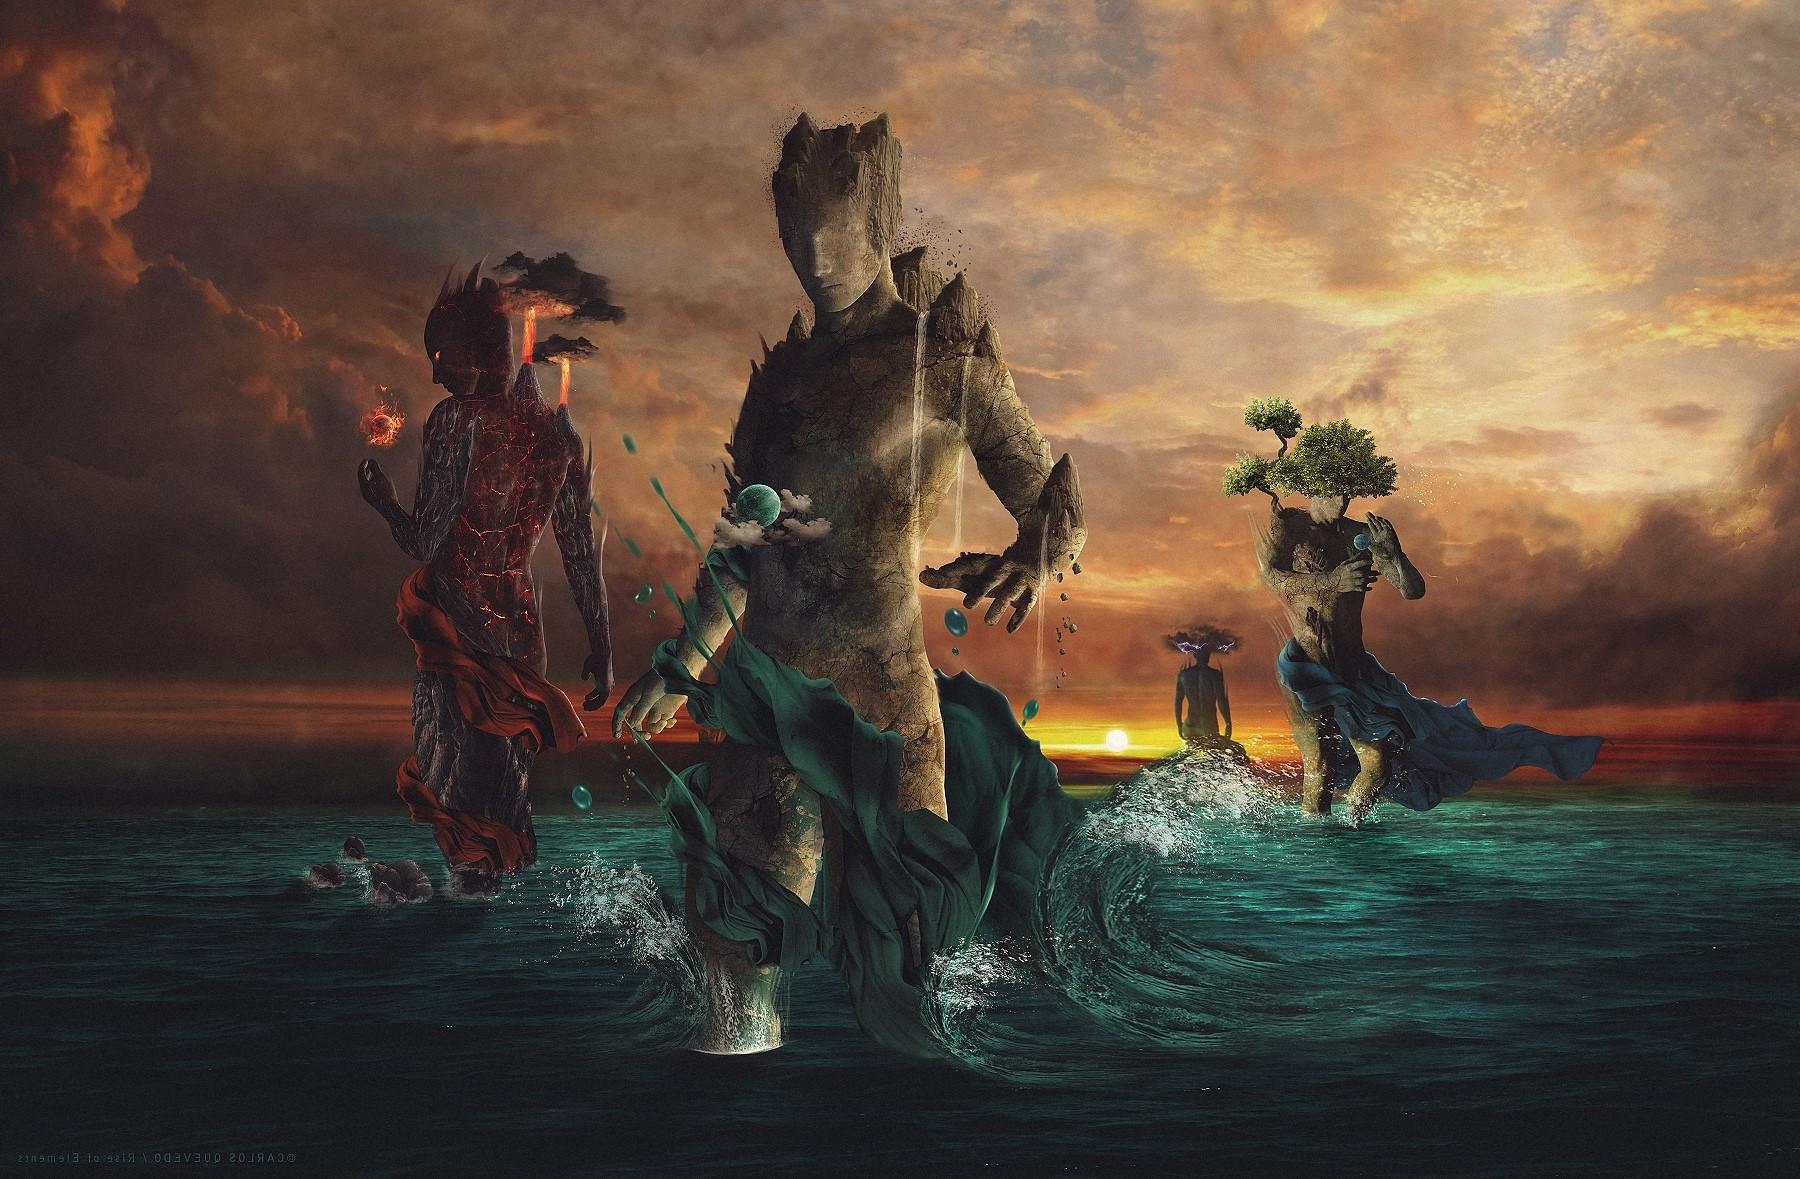 Wallpaper digital art fantasy art sunset water earth - Fantasy wallpaper digital art ...